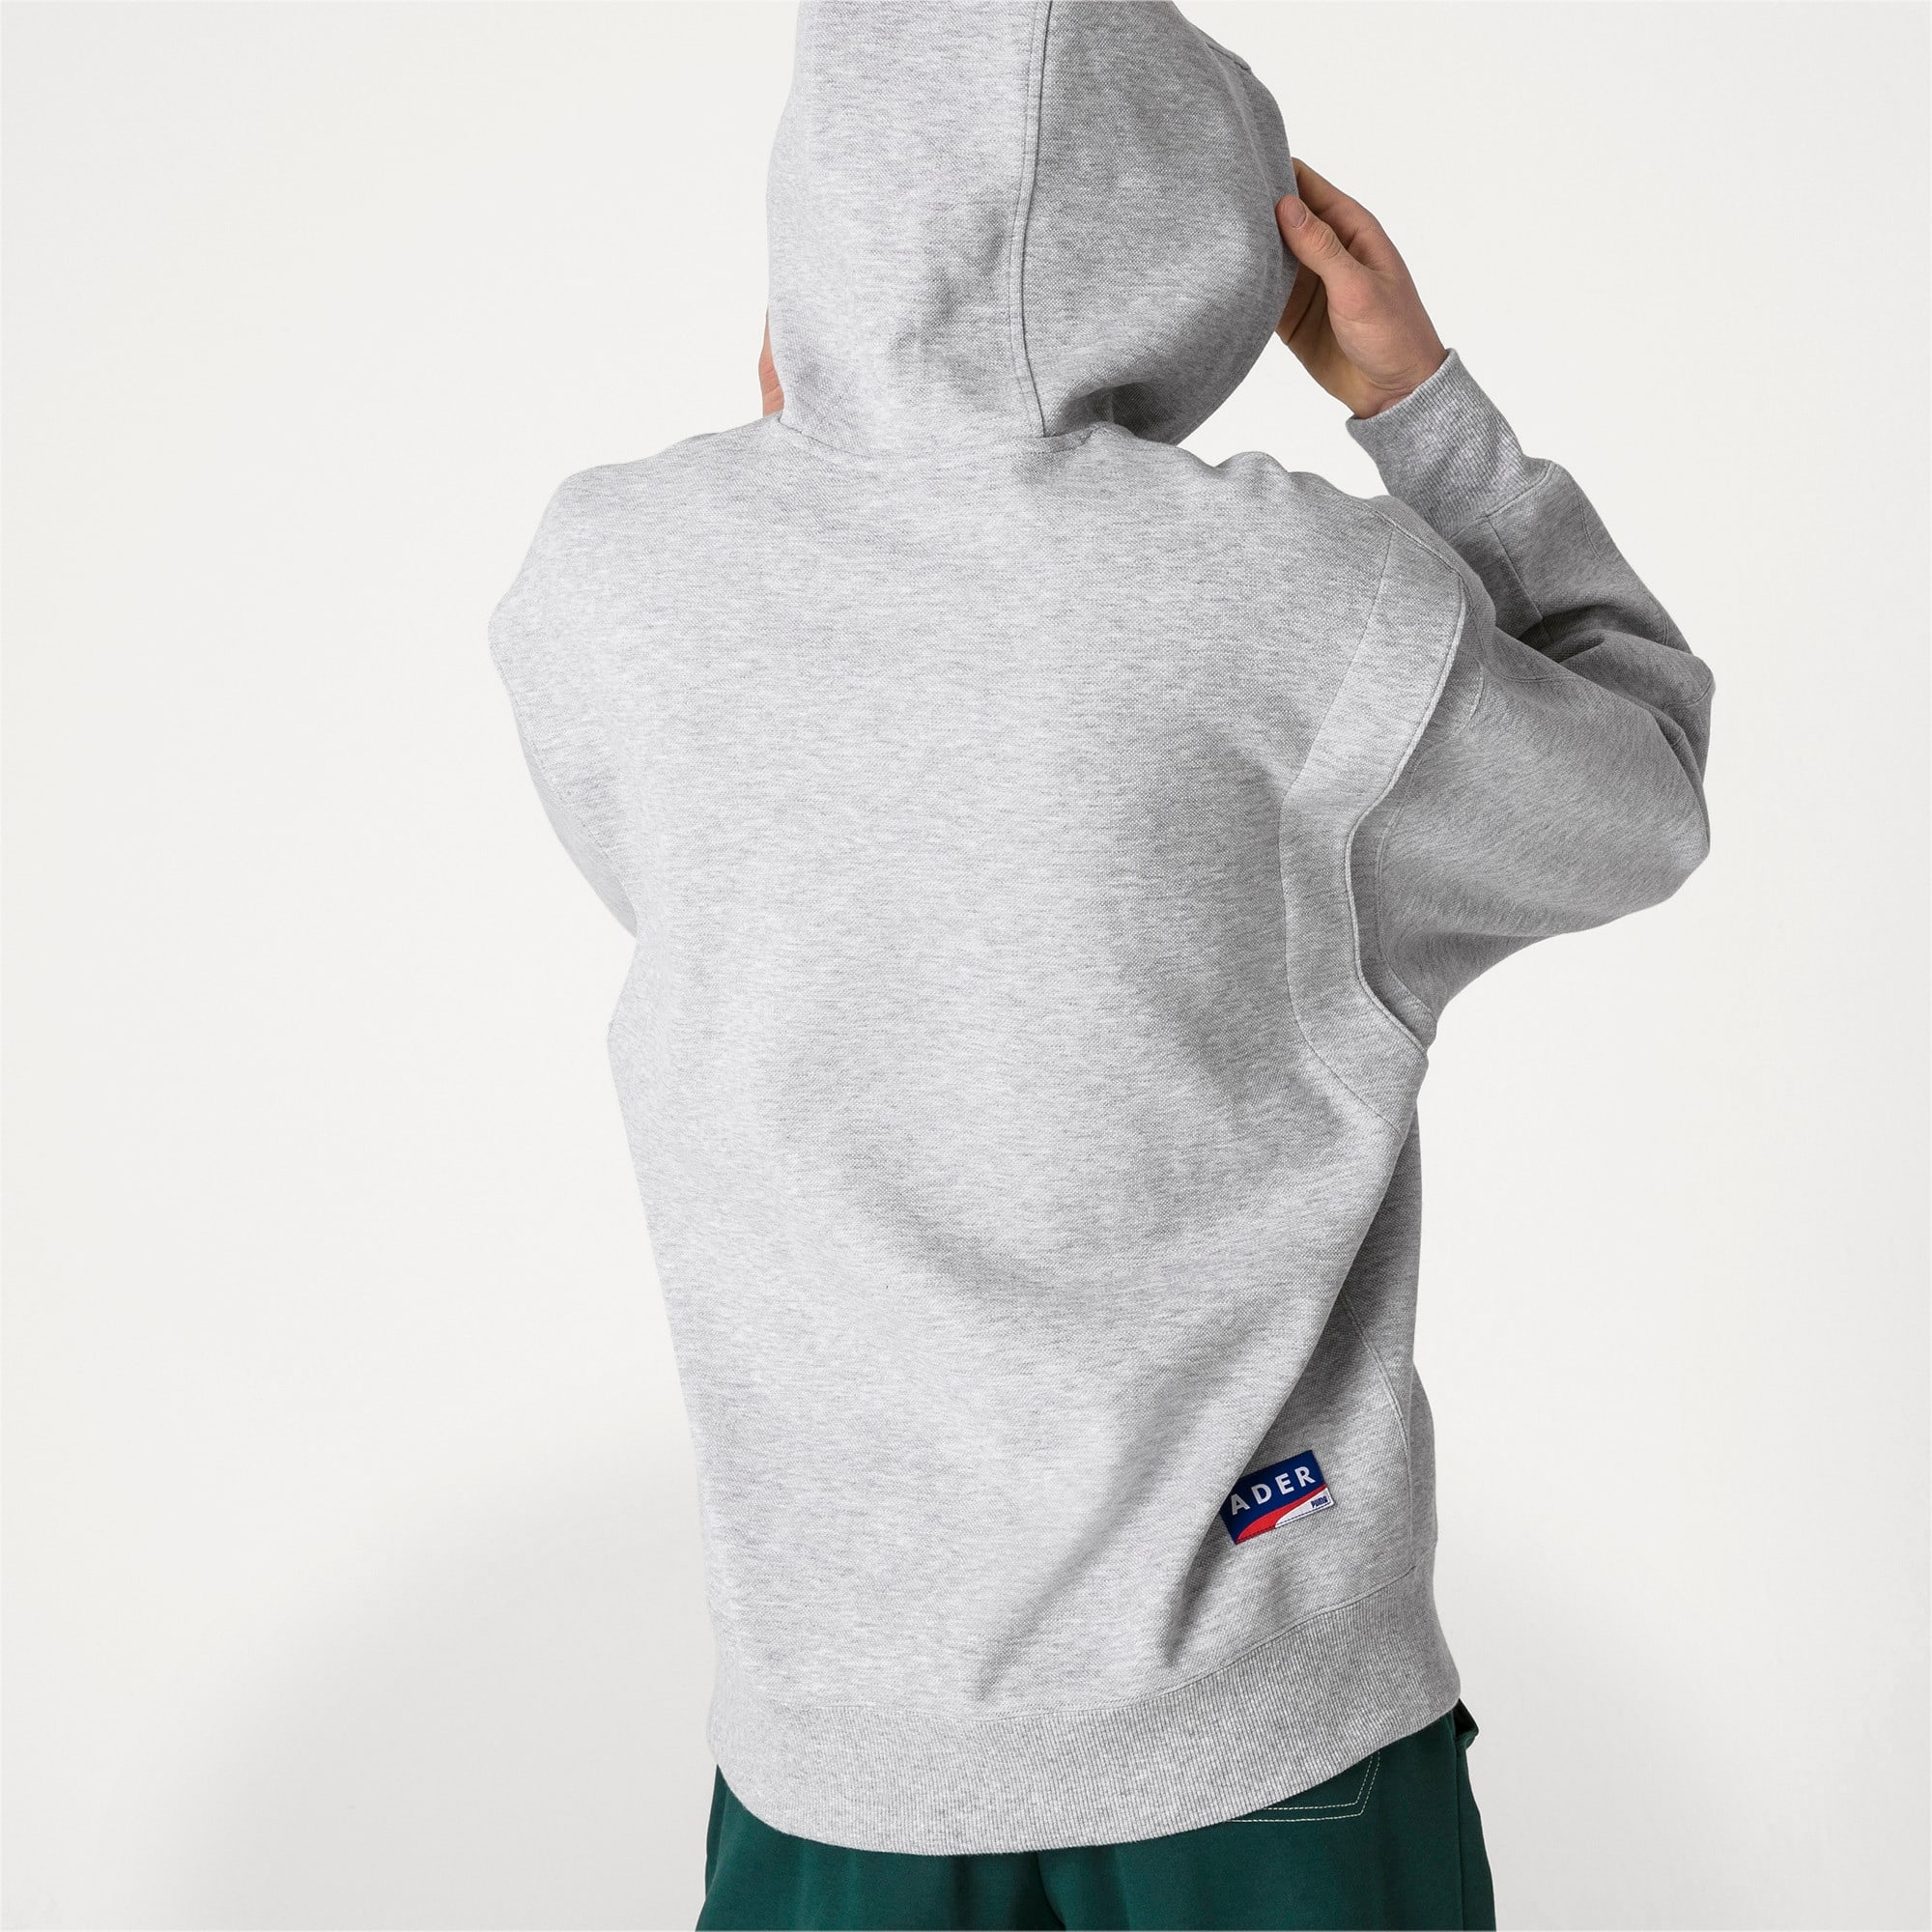 Thumbnail 3 of PUMA x ADER ERROR hoodie, Light Gray Heather, medium